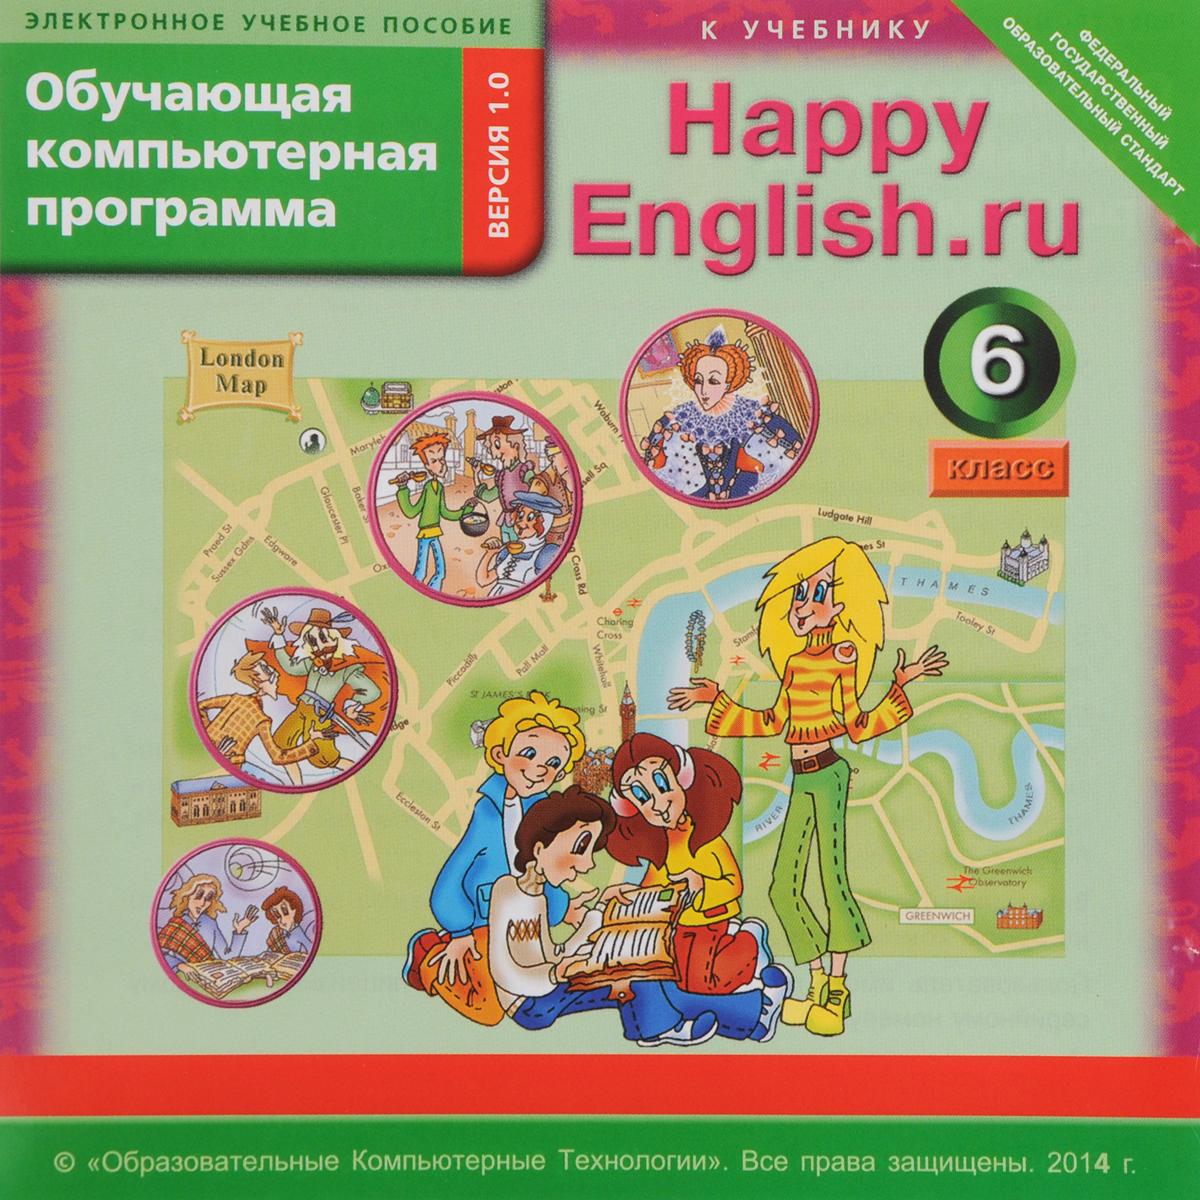 Happy English.ru 6 / Счастливый английский.ру. 6 класс. Обучающая компьютерная программа Титул